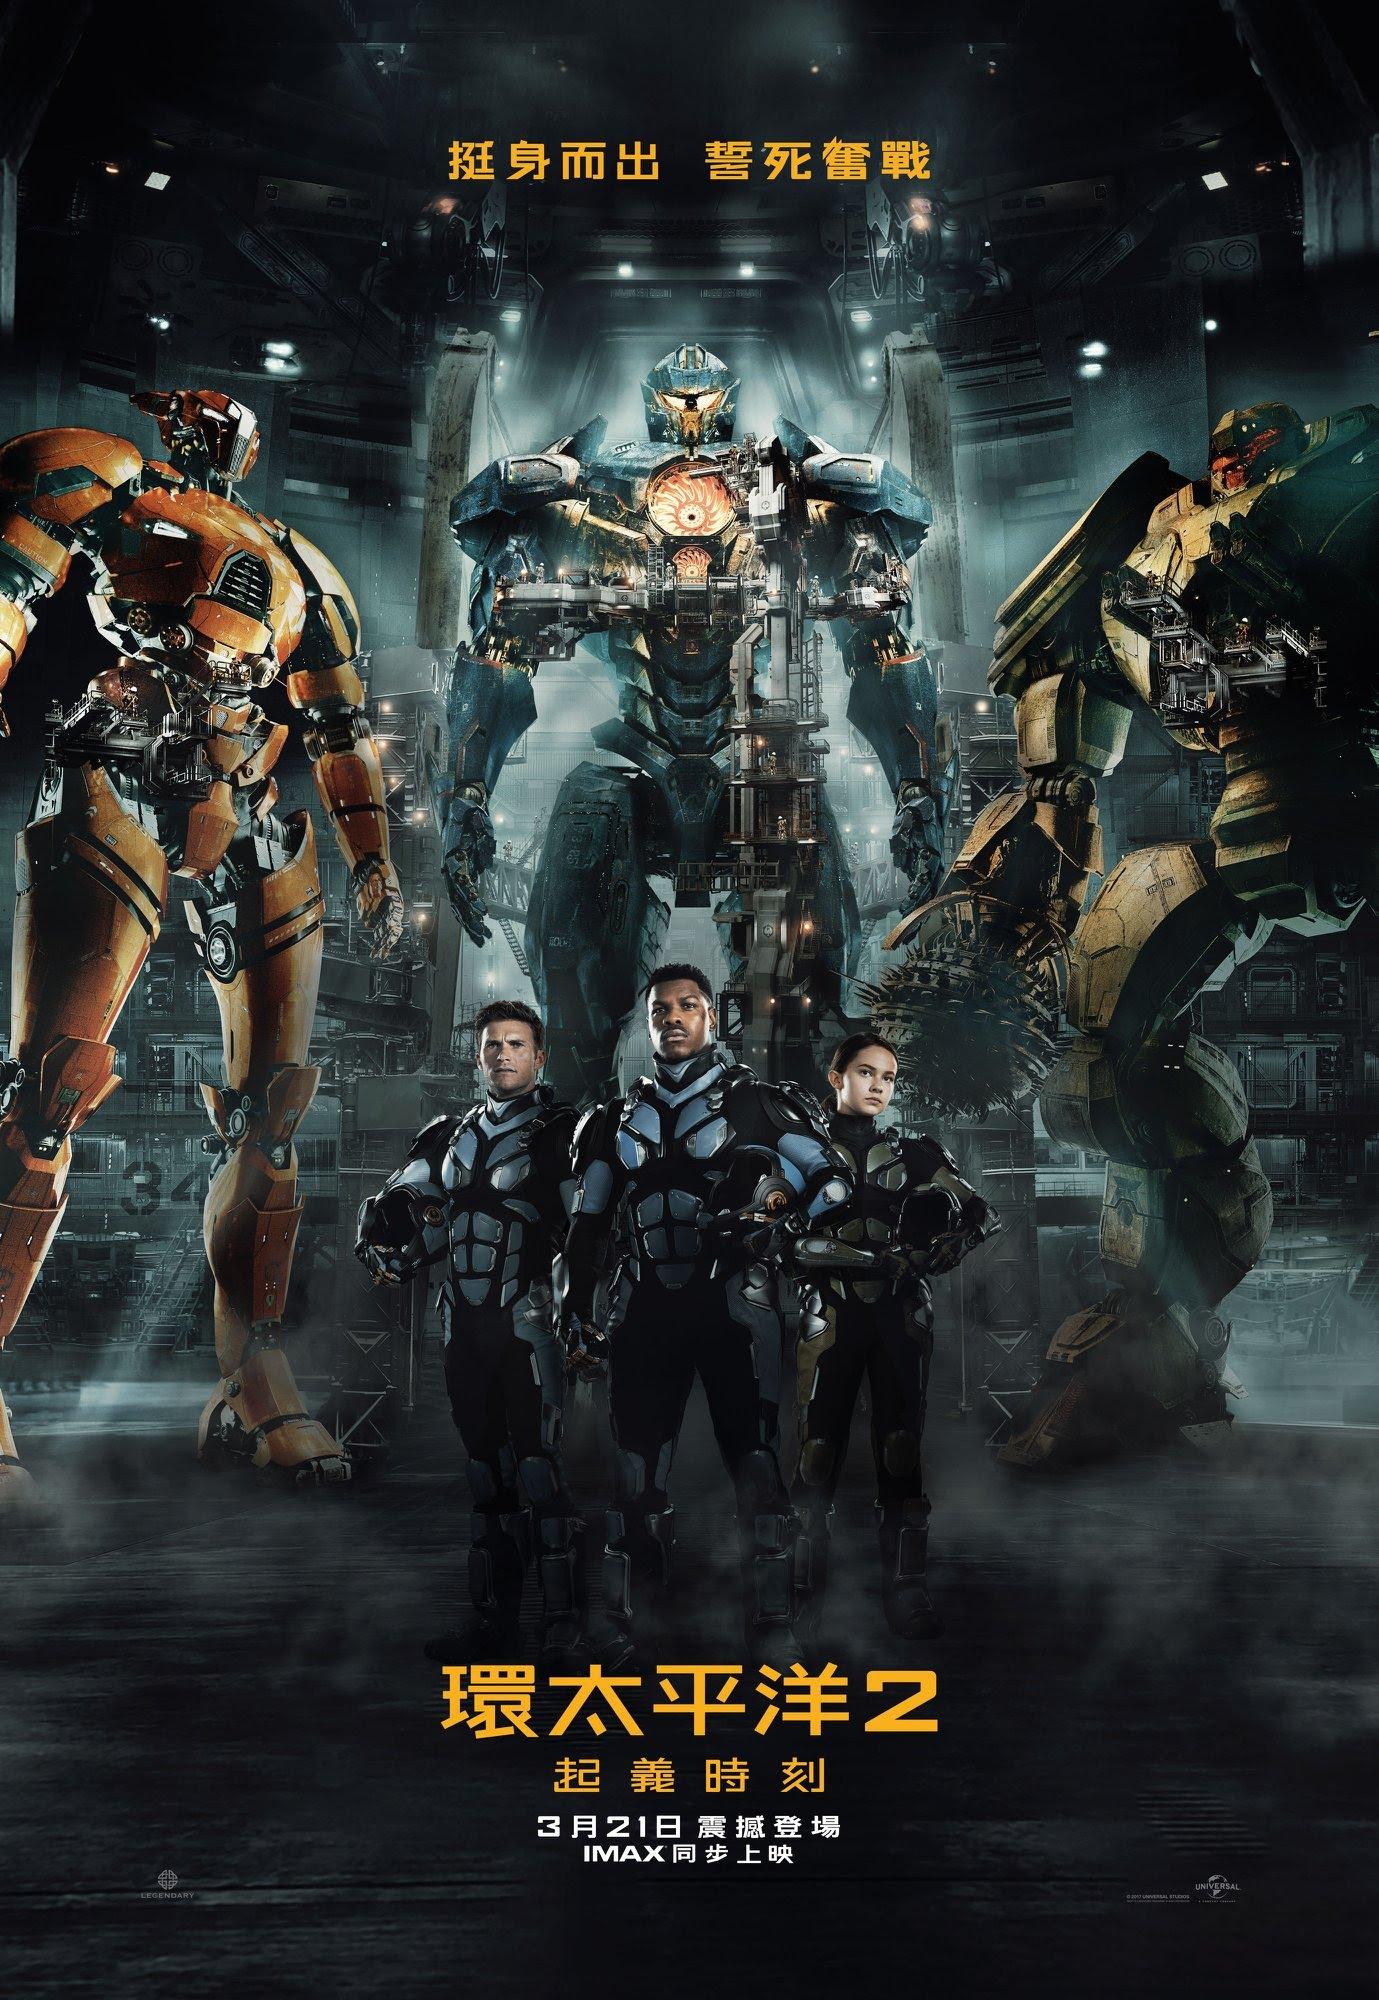 Pacific Rim : 大怪獣VS巨大ロボットの続篇「環太平洋 2 : 起義時刻 ...